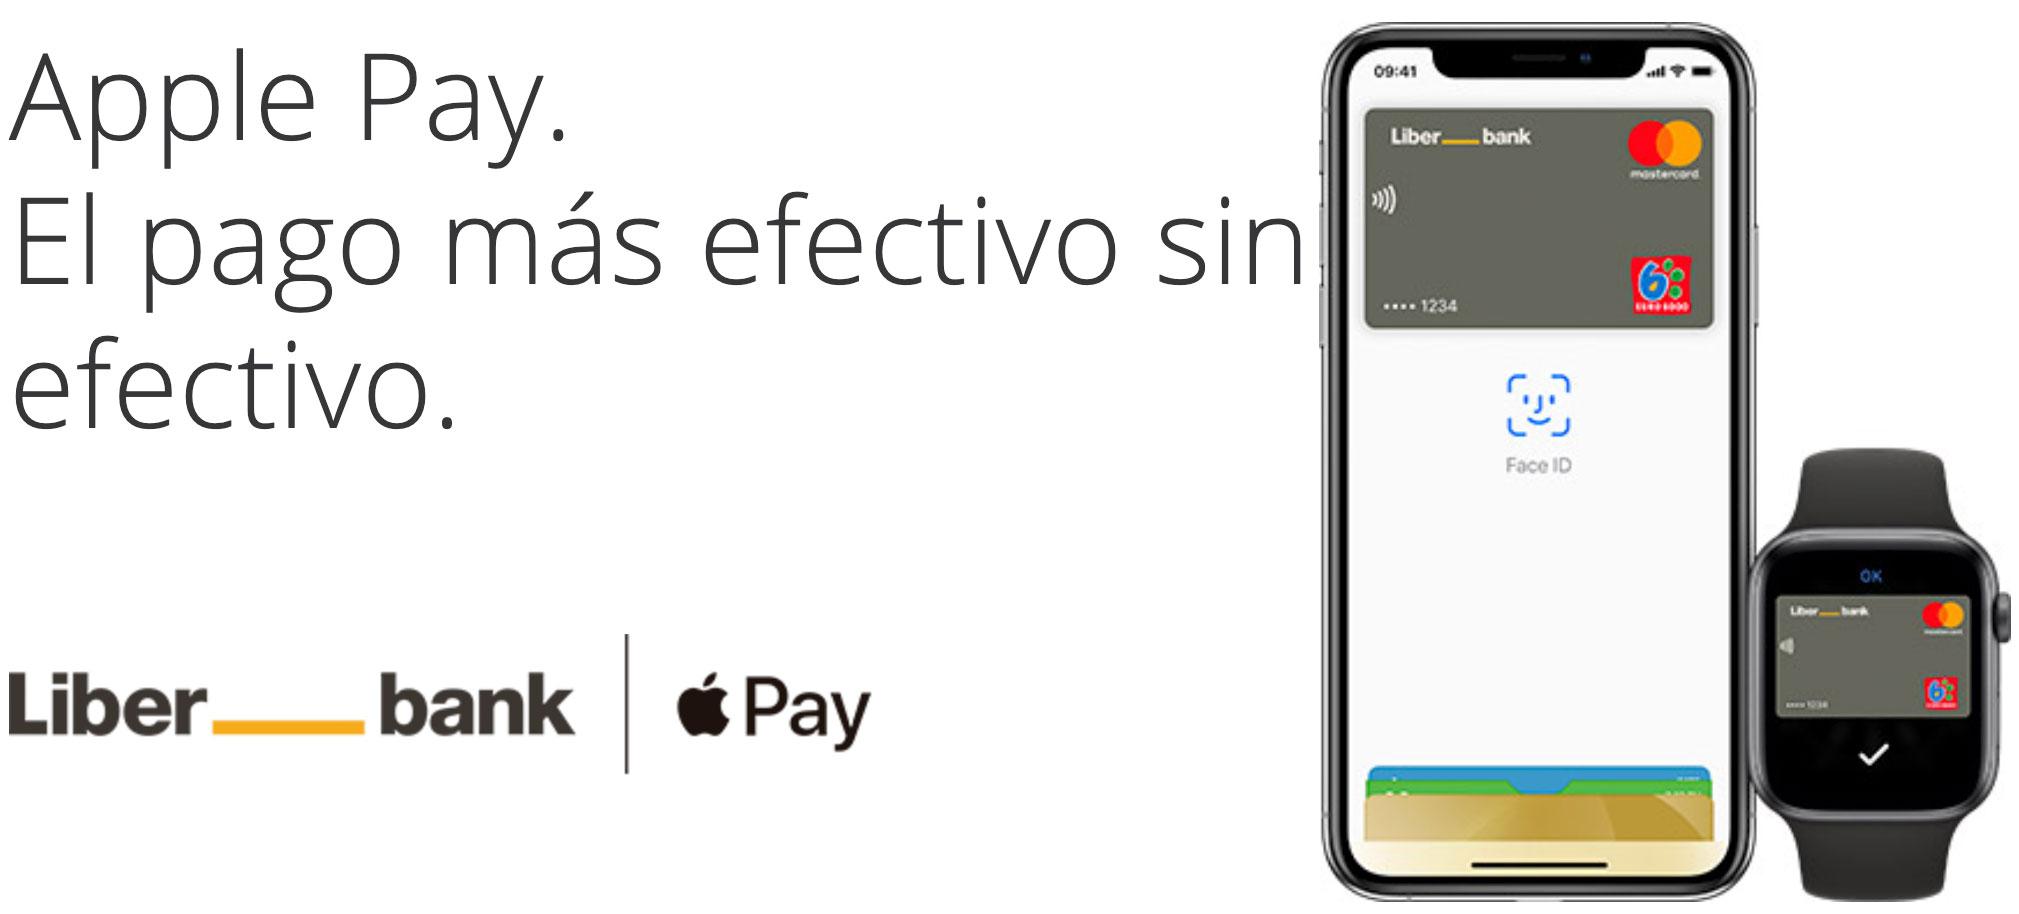 Liberbank y Apple Pay